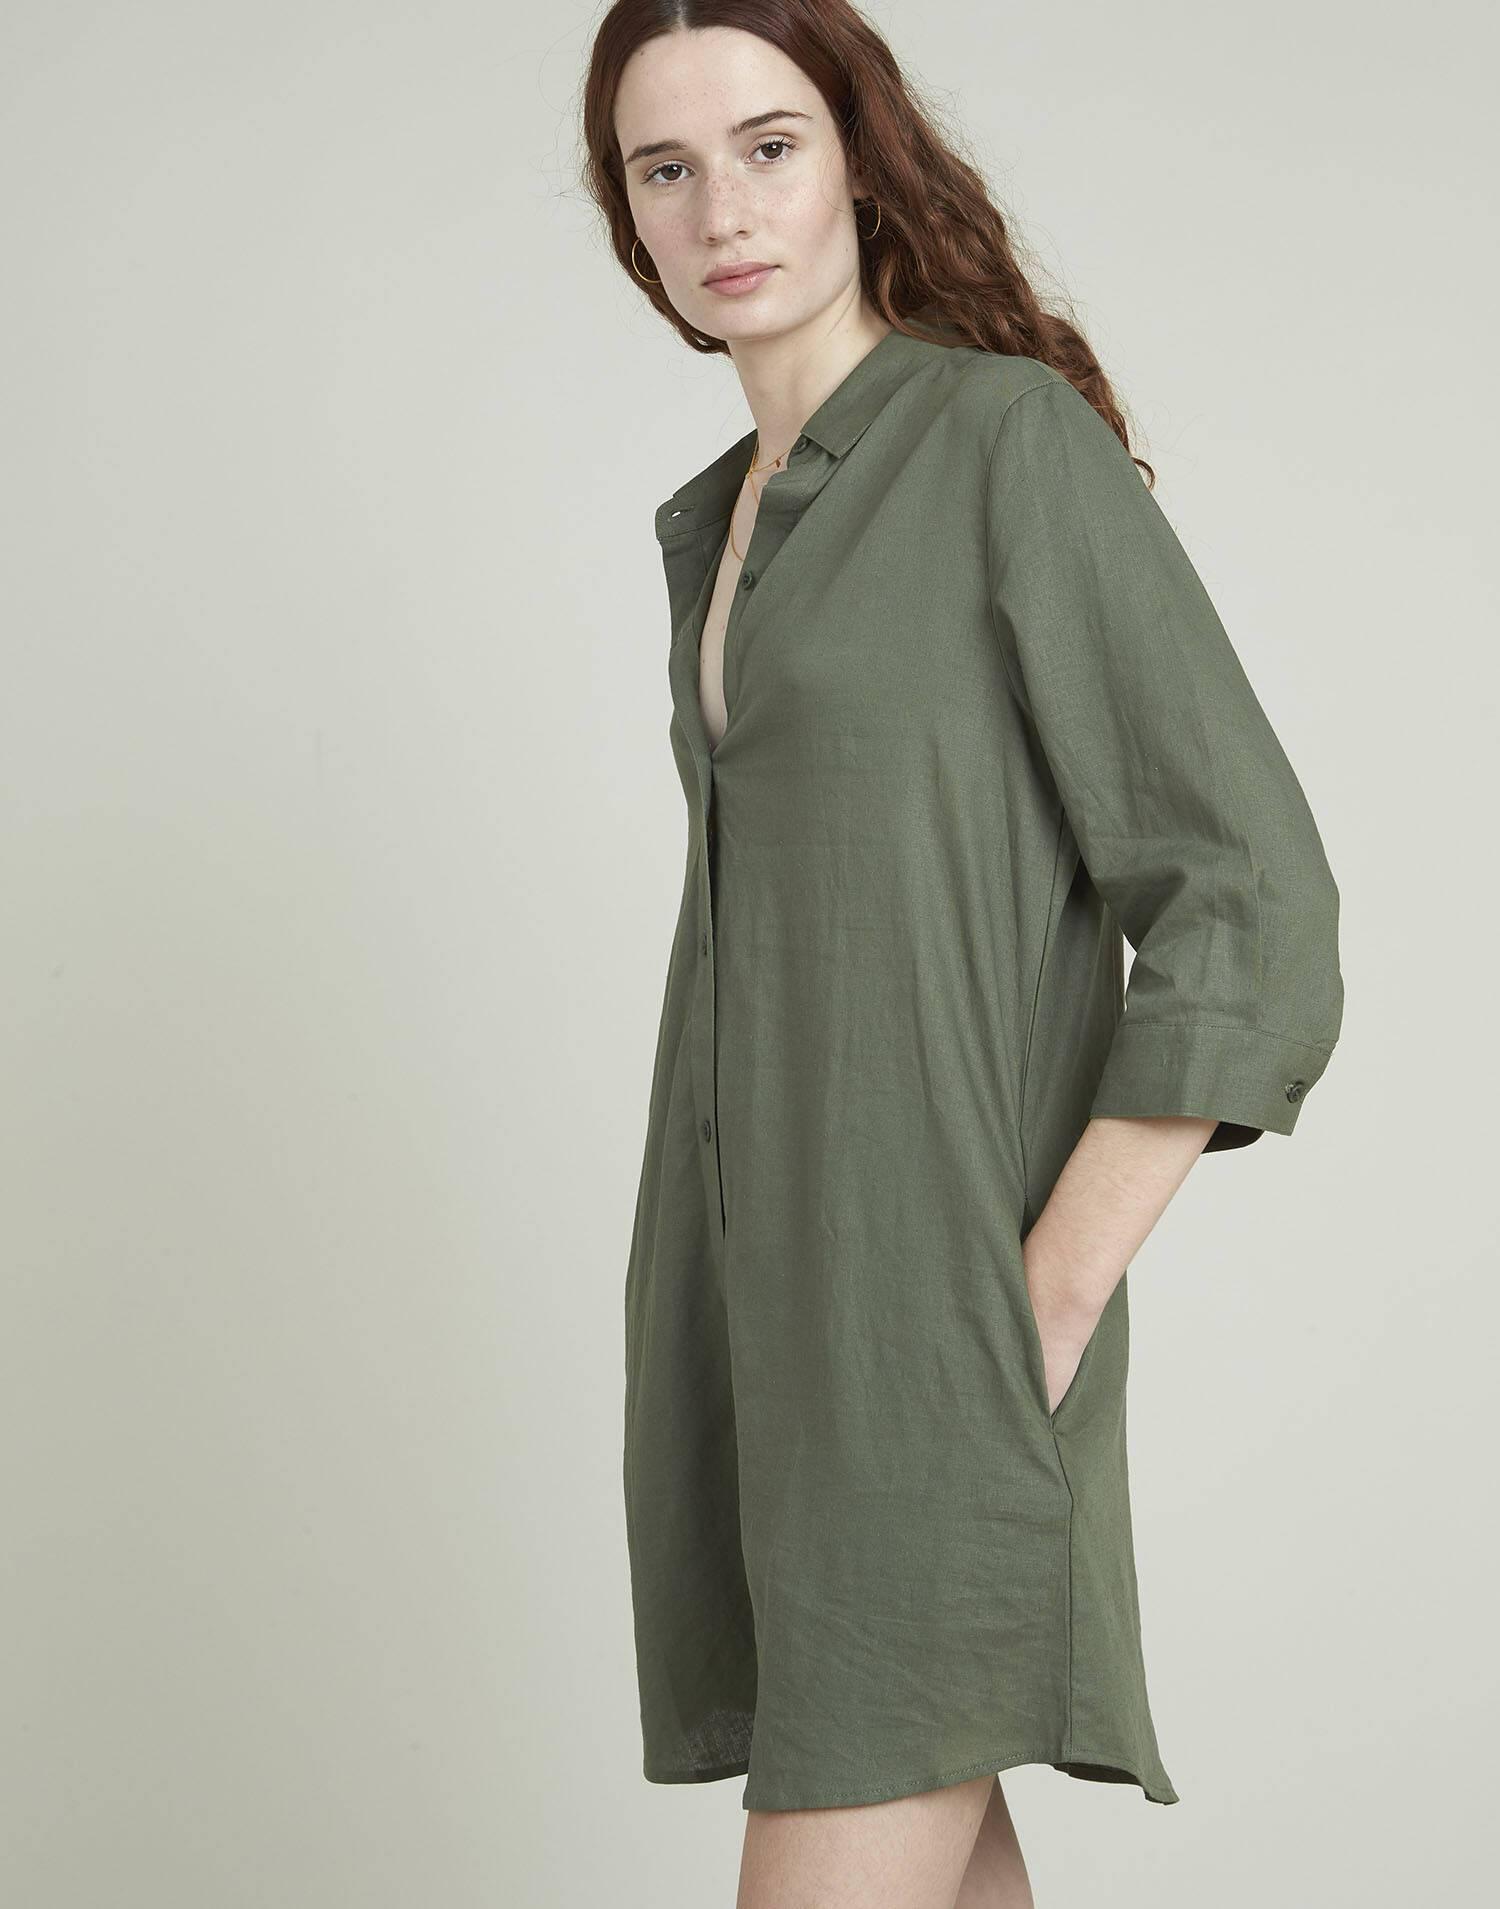 Vestido camisero lino